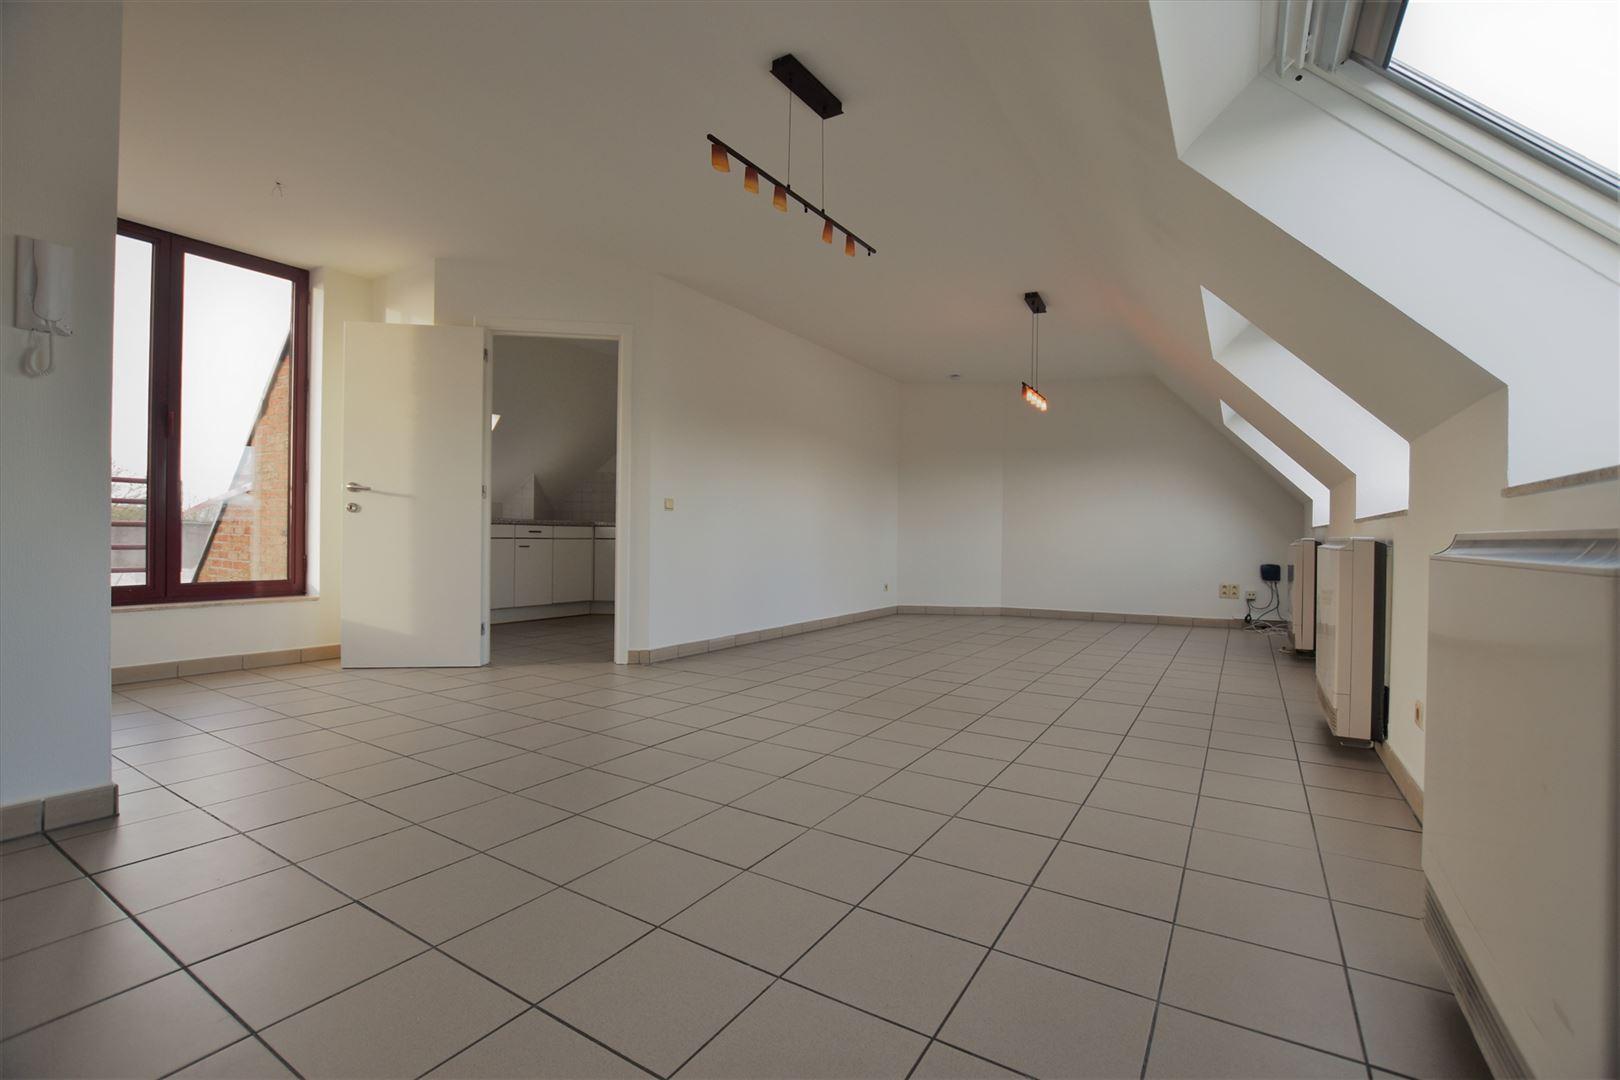 Foto 6 : Appartement te 9280 Lebbeke (België) - Prijs € 645